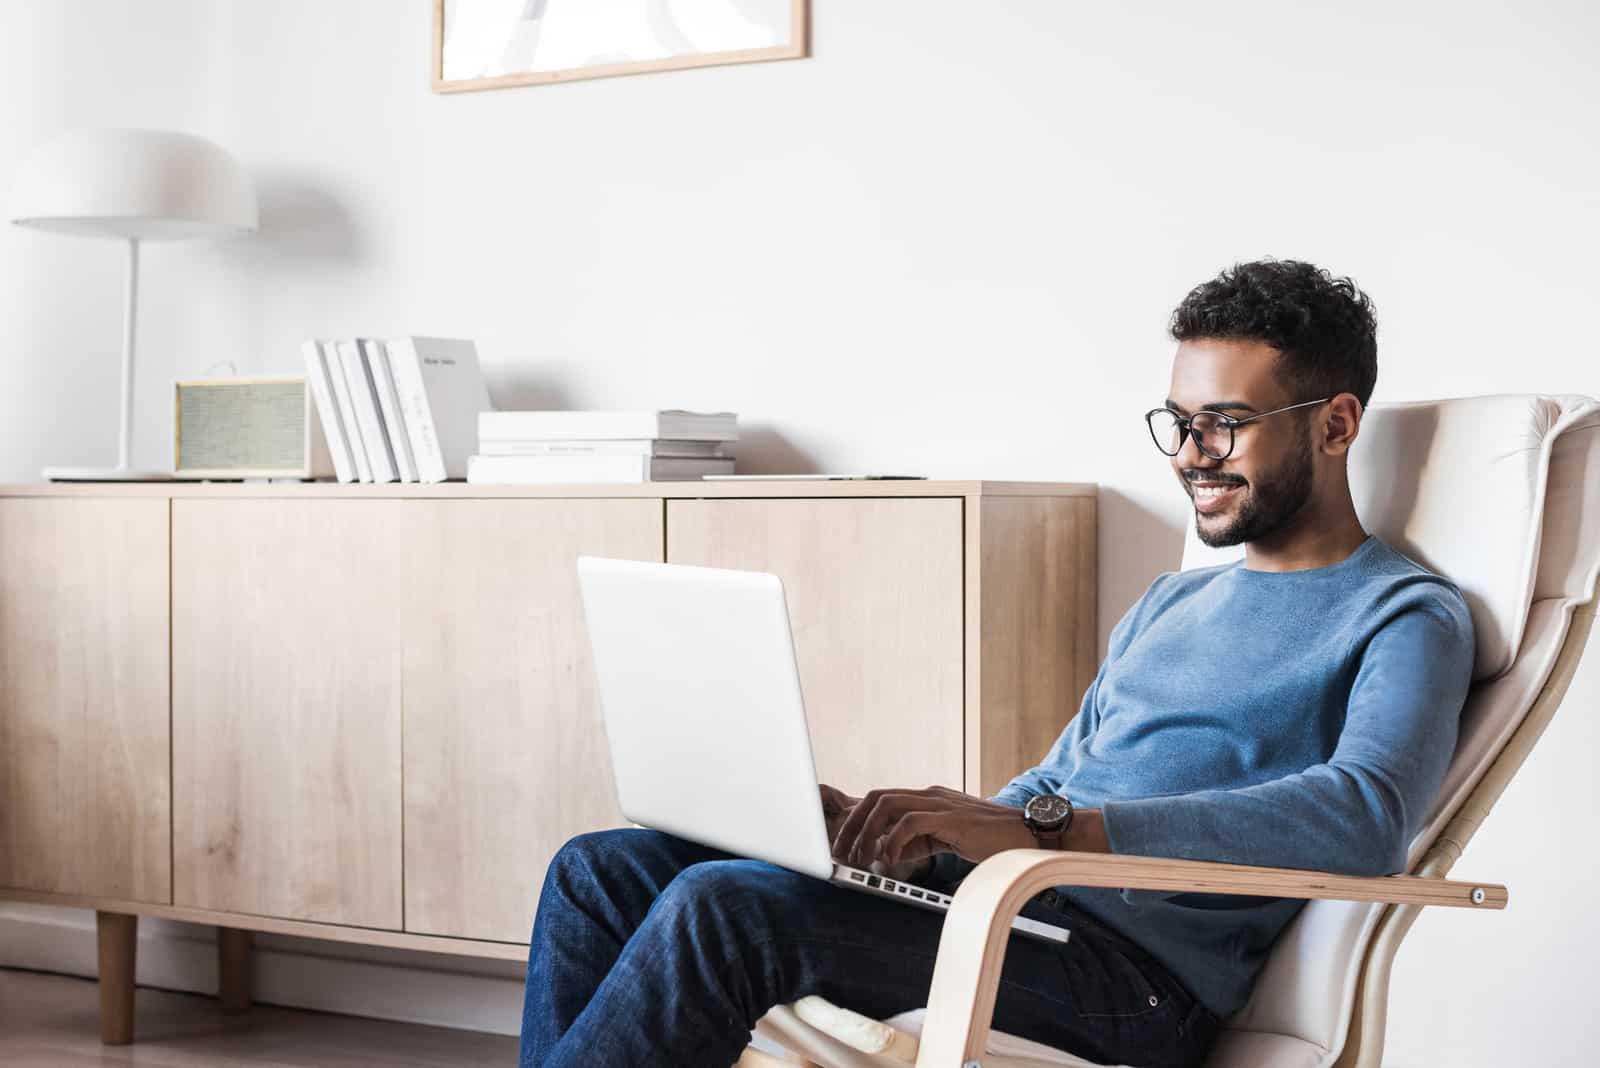 Cheerful man using laptop computer at home